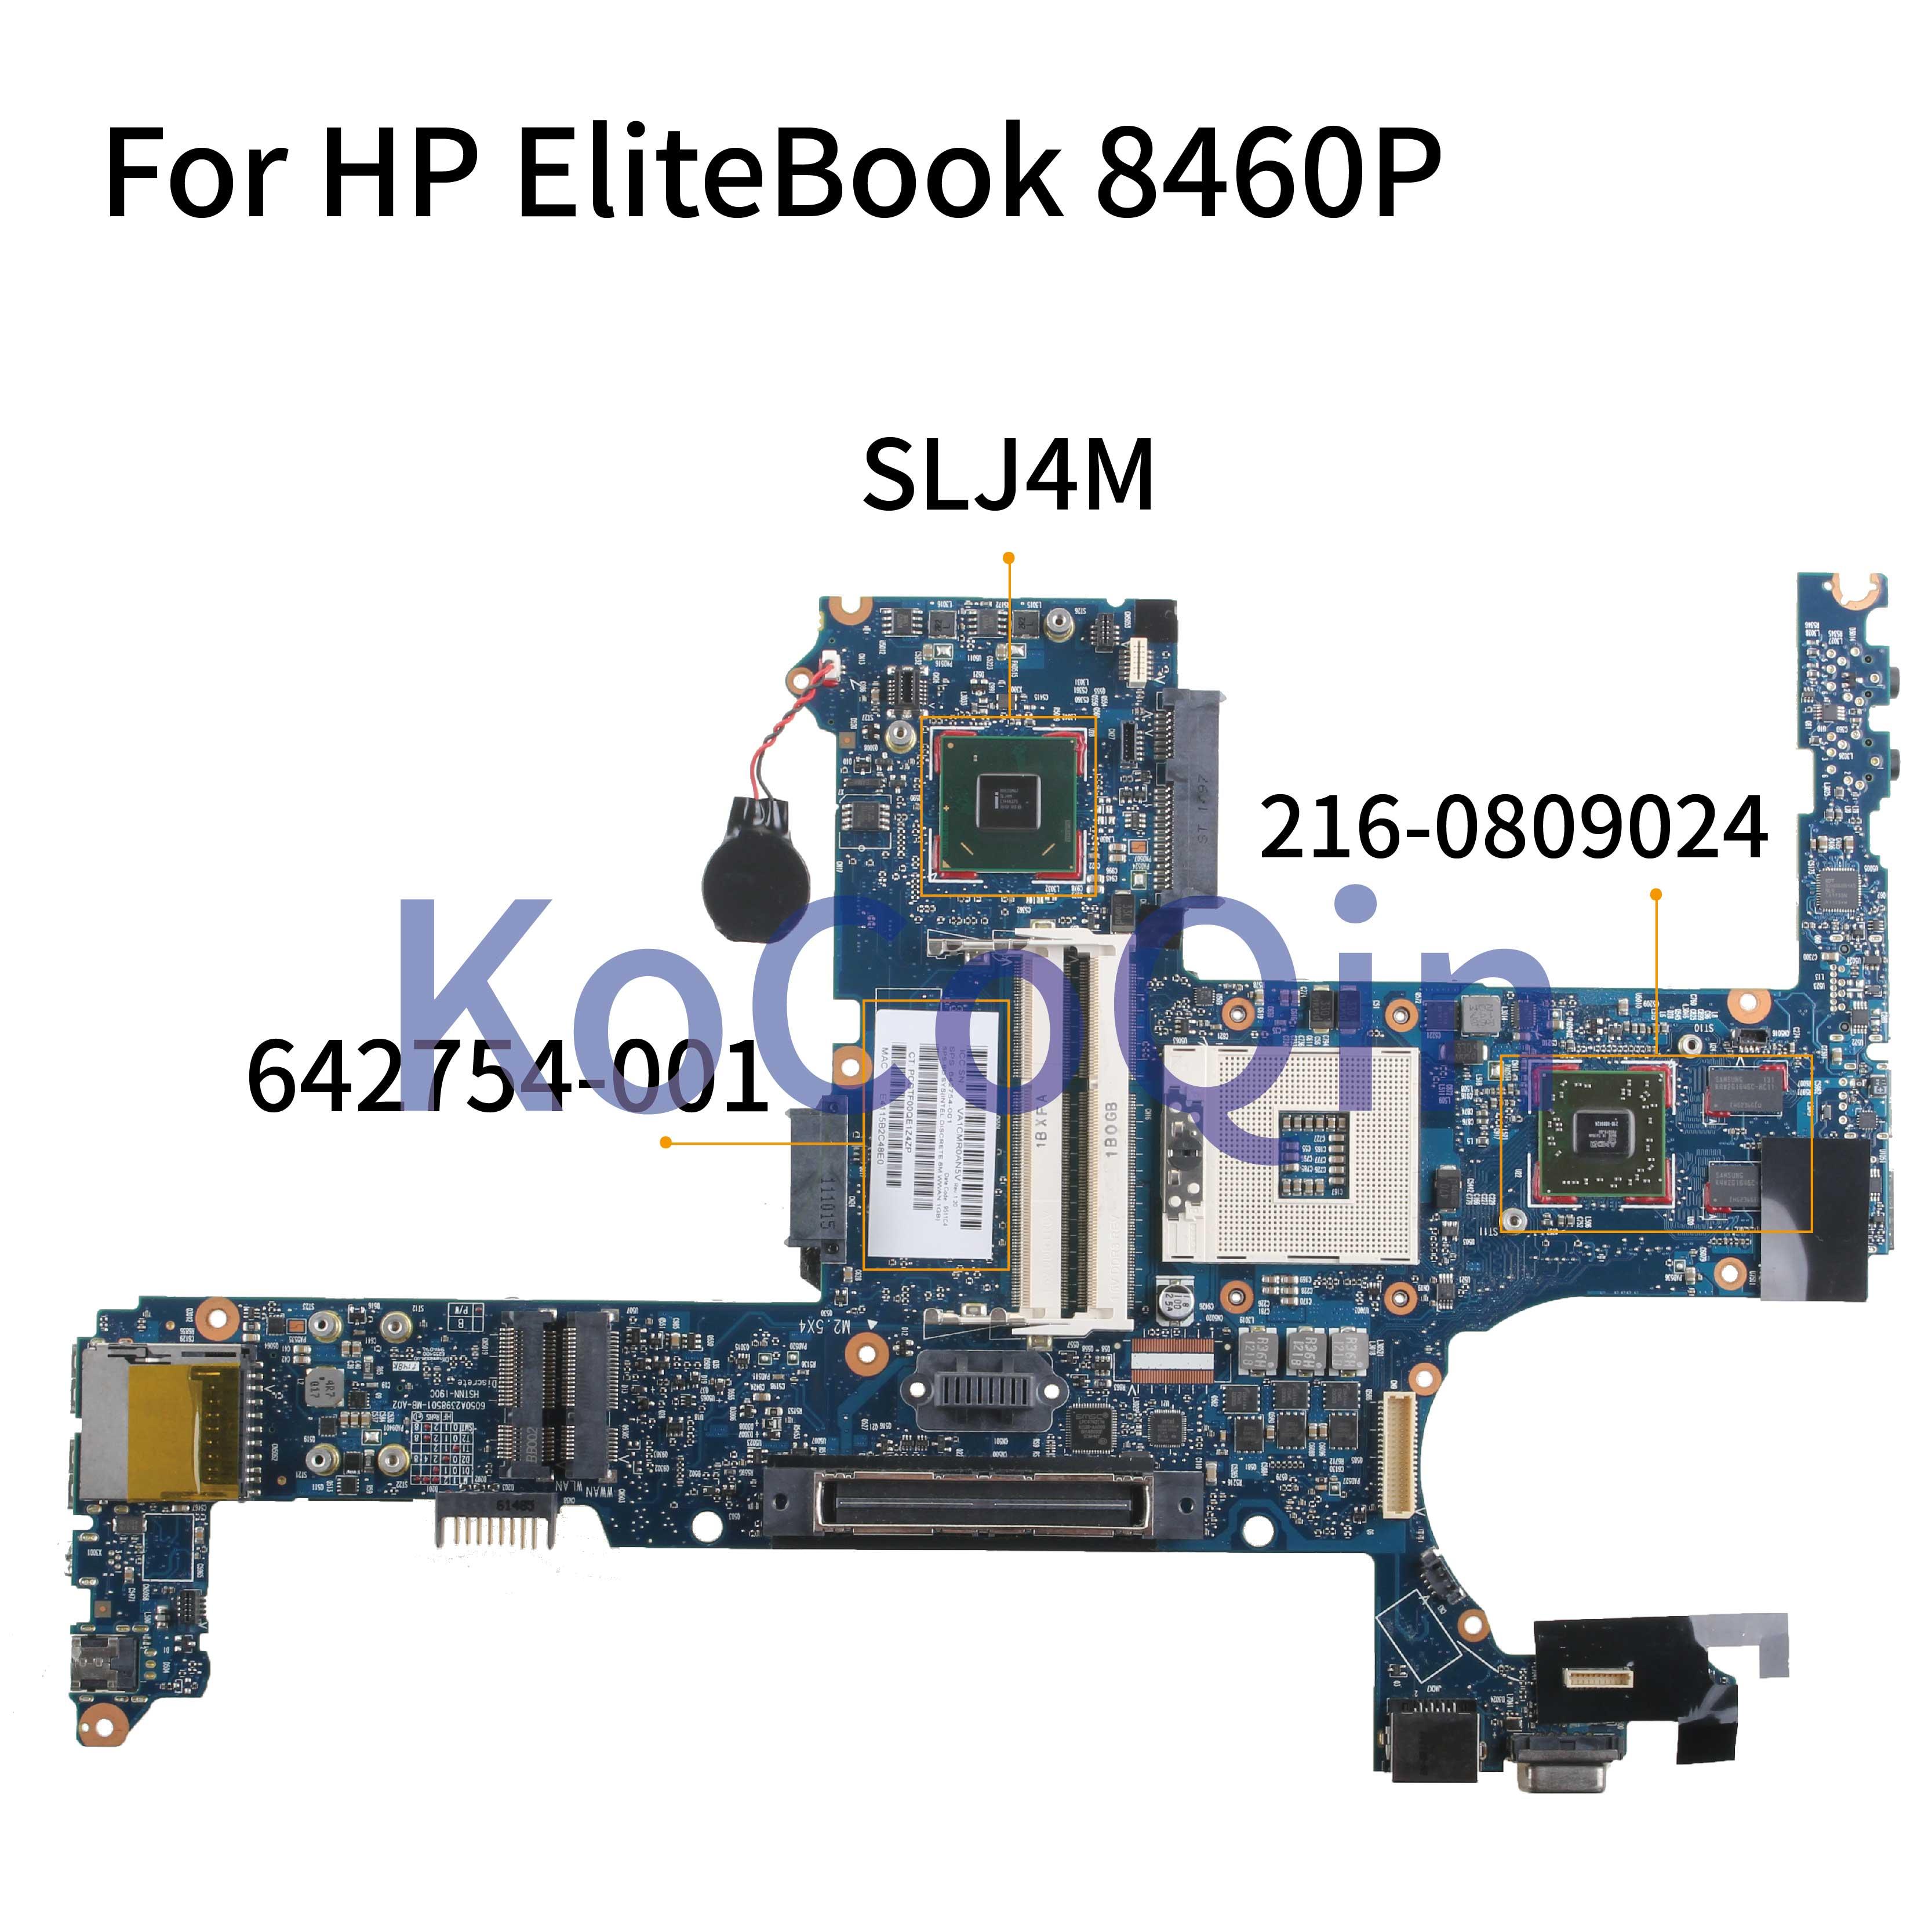 KoCoQin Laptop Motherboard For HP EliteBook 6460B 8460P Mainboard 642754-001 642754-501 6050A2398501 SLJ4M 216-0809024